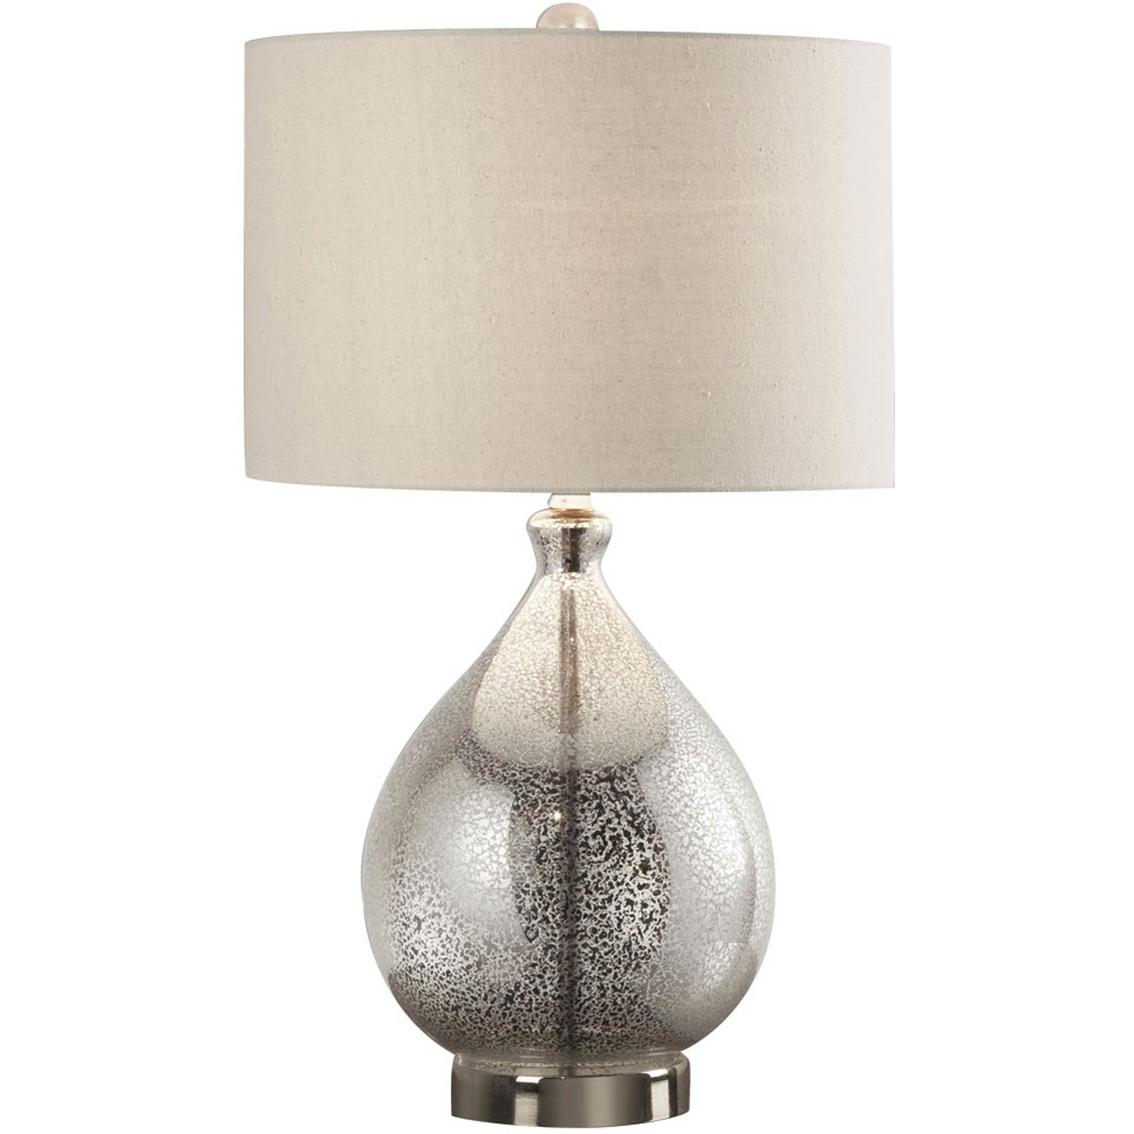 silver mercury glass tear drop table lamp - Mercury Glass Lamps